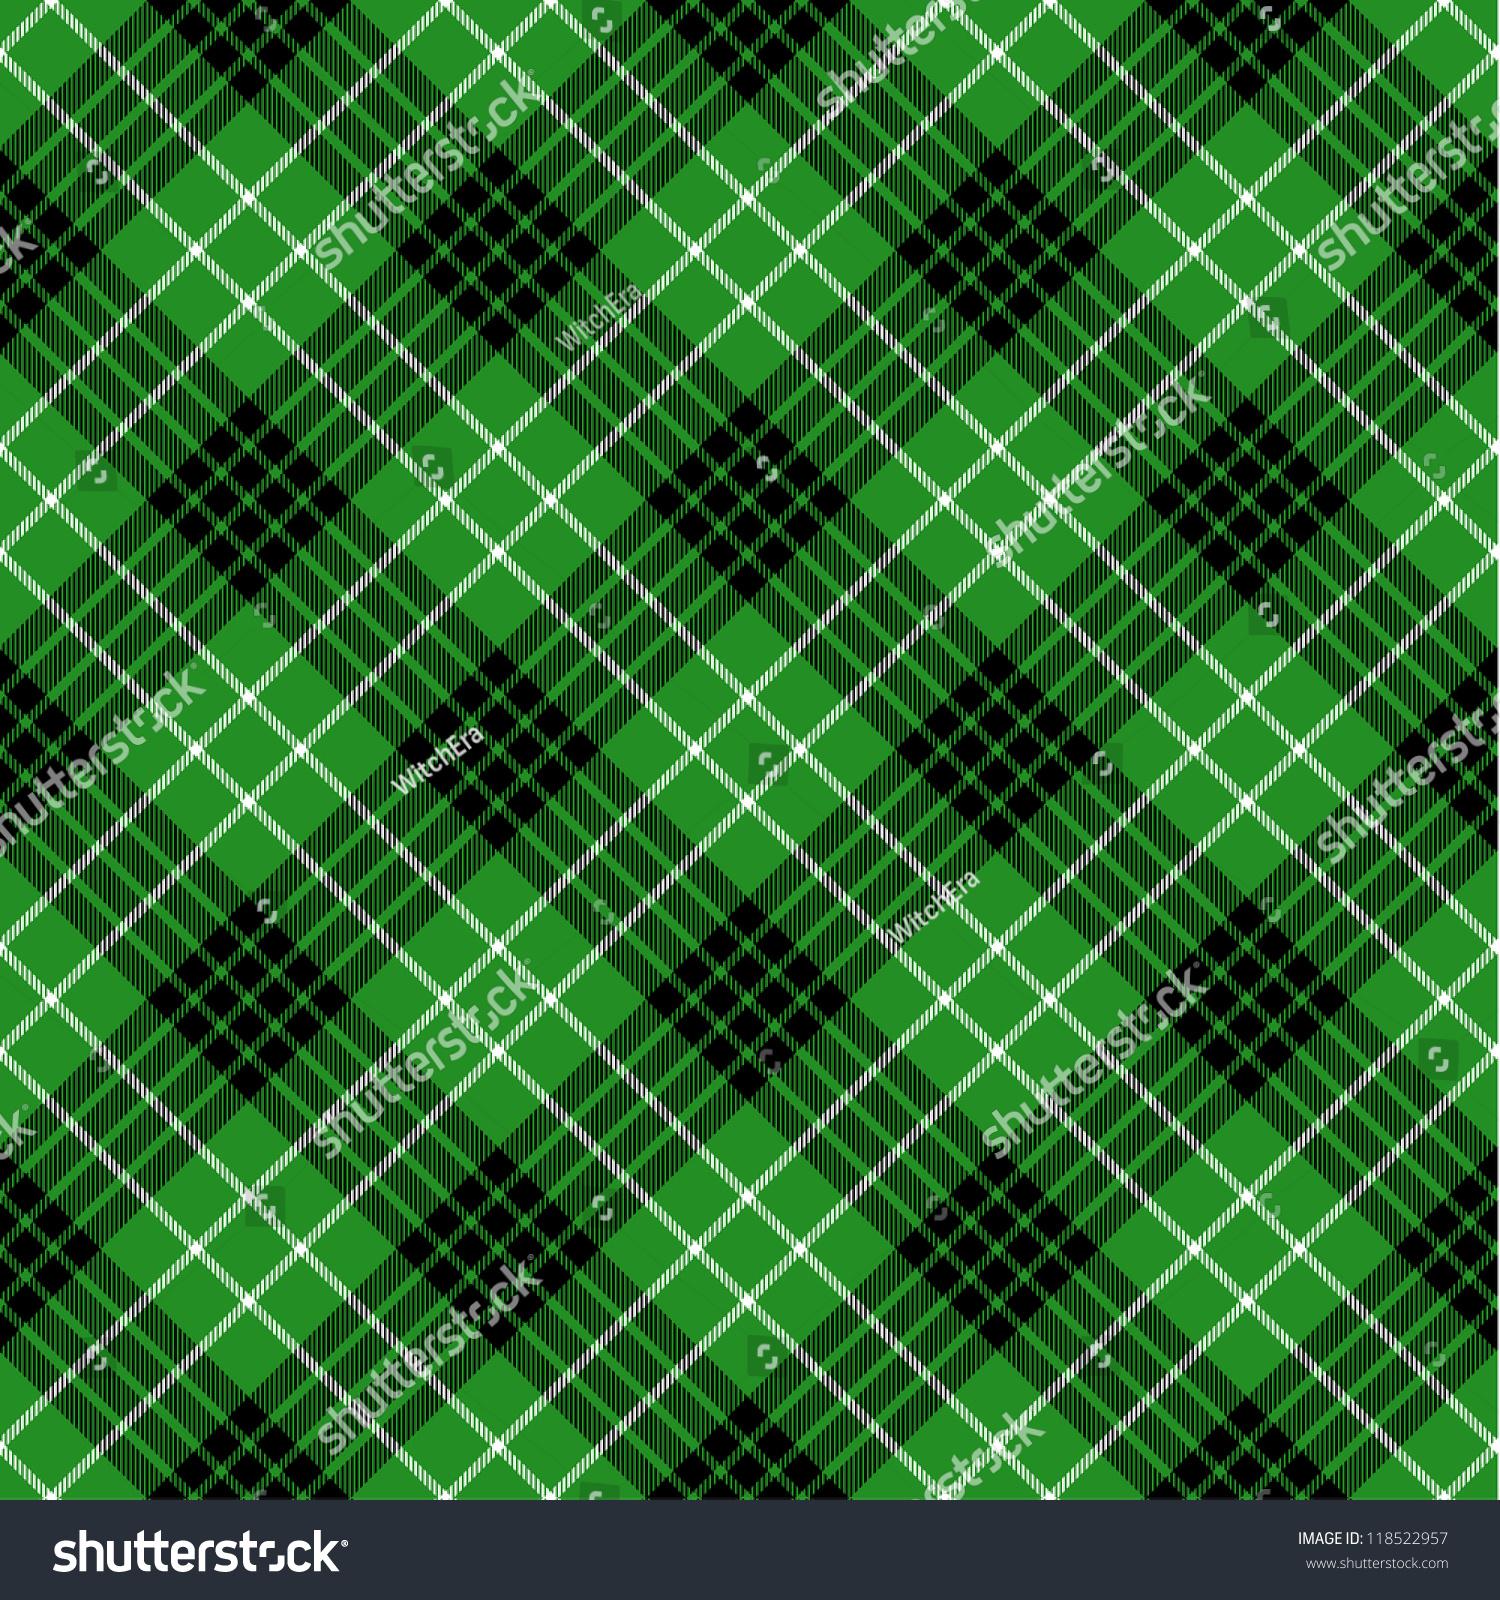 Tartan Pattern seamless tartan pattern stock vector 118522957 - shutterstock